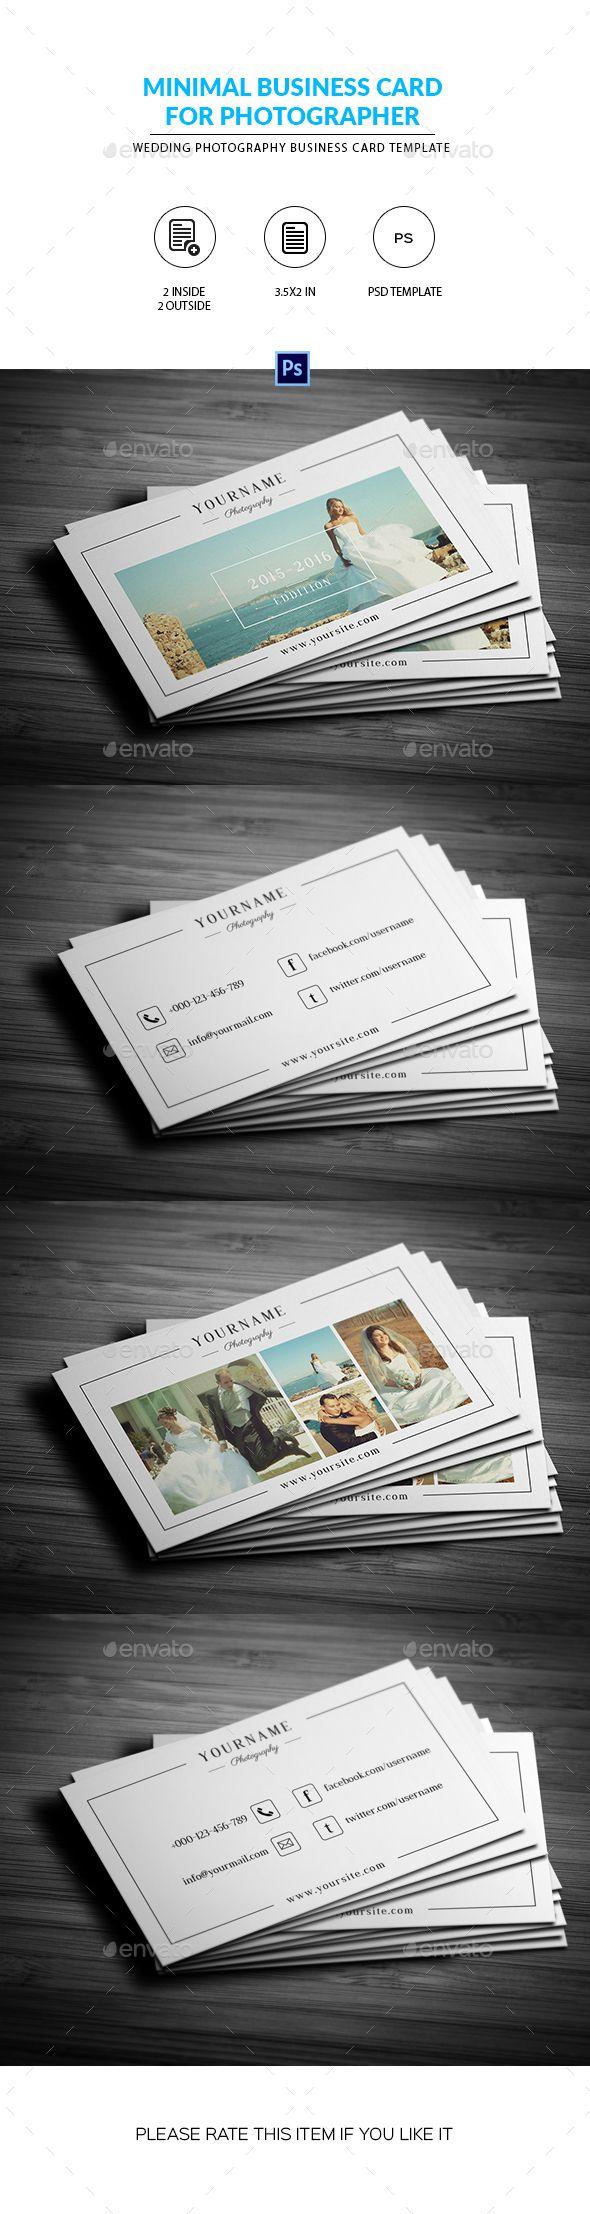 Minimal Wedding Photography Business Card | Minimal wedding ...